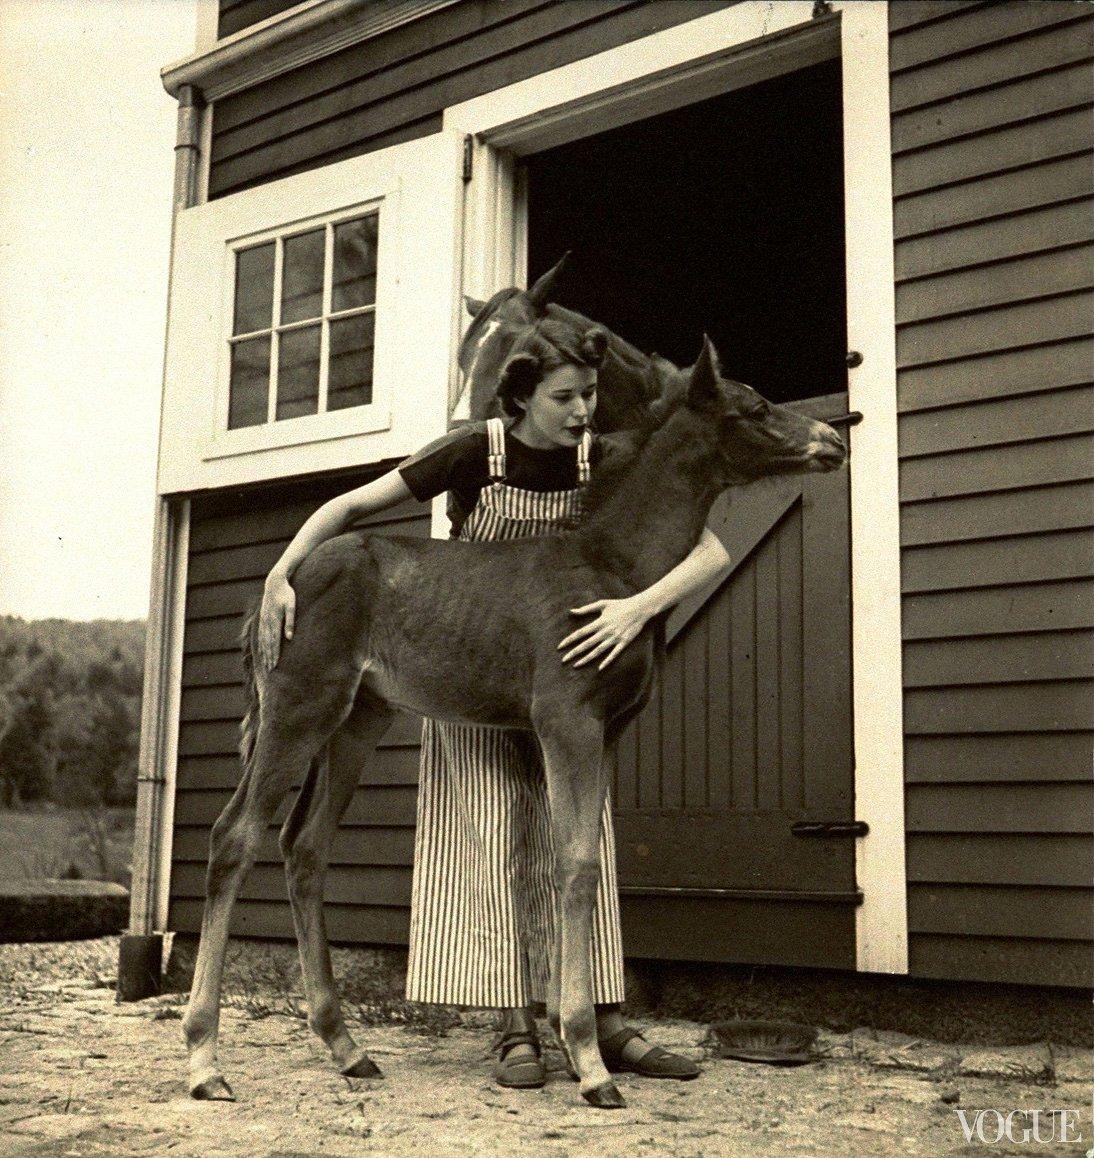 horses-in-vogue-03_153357907374